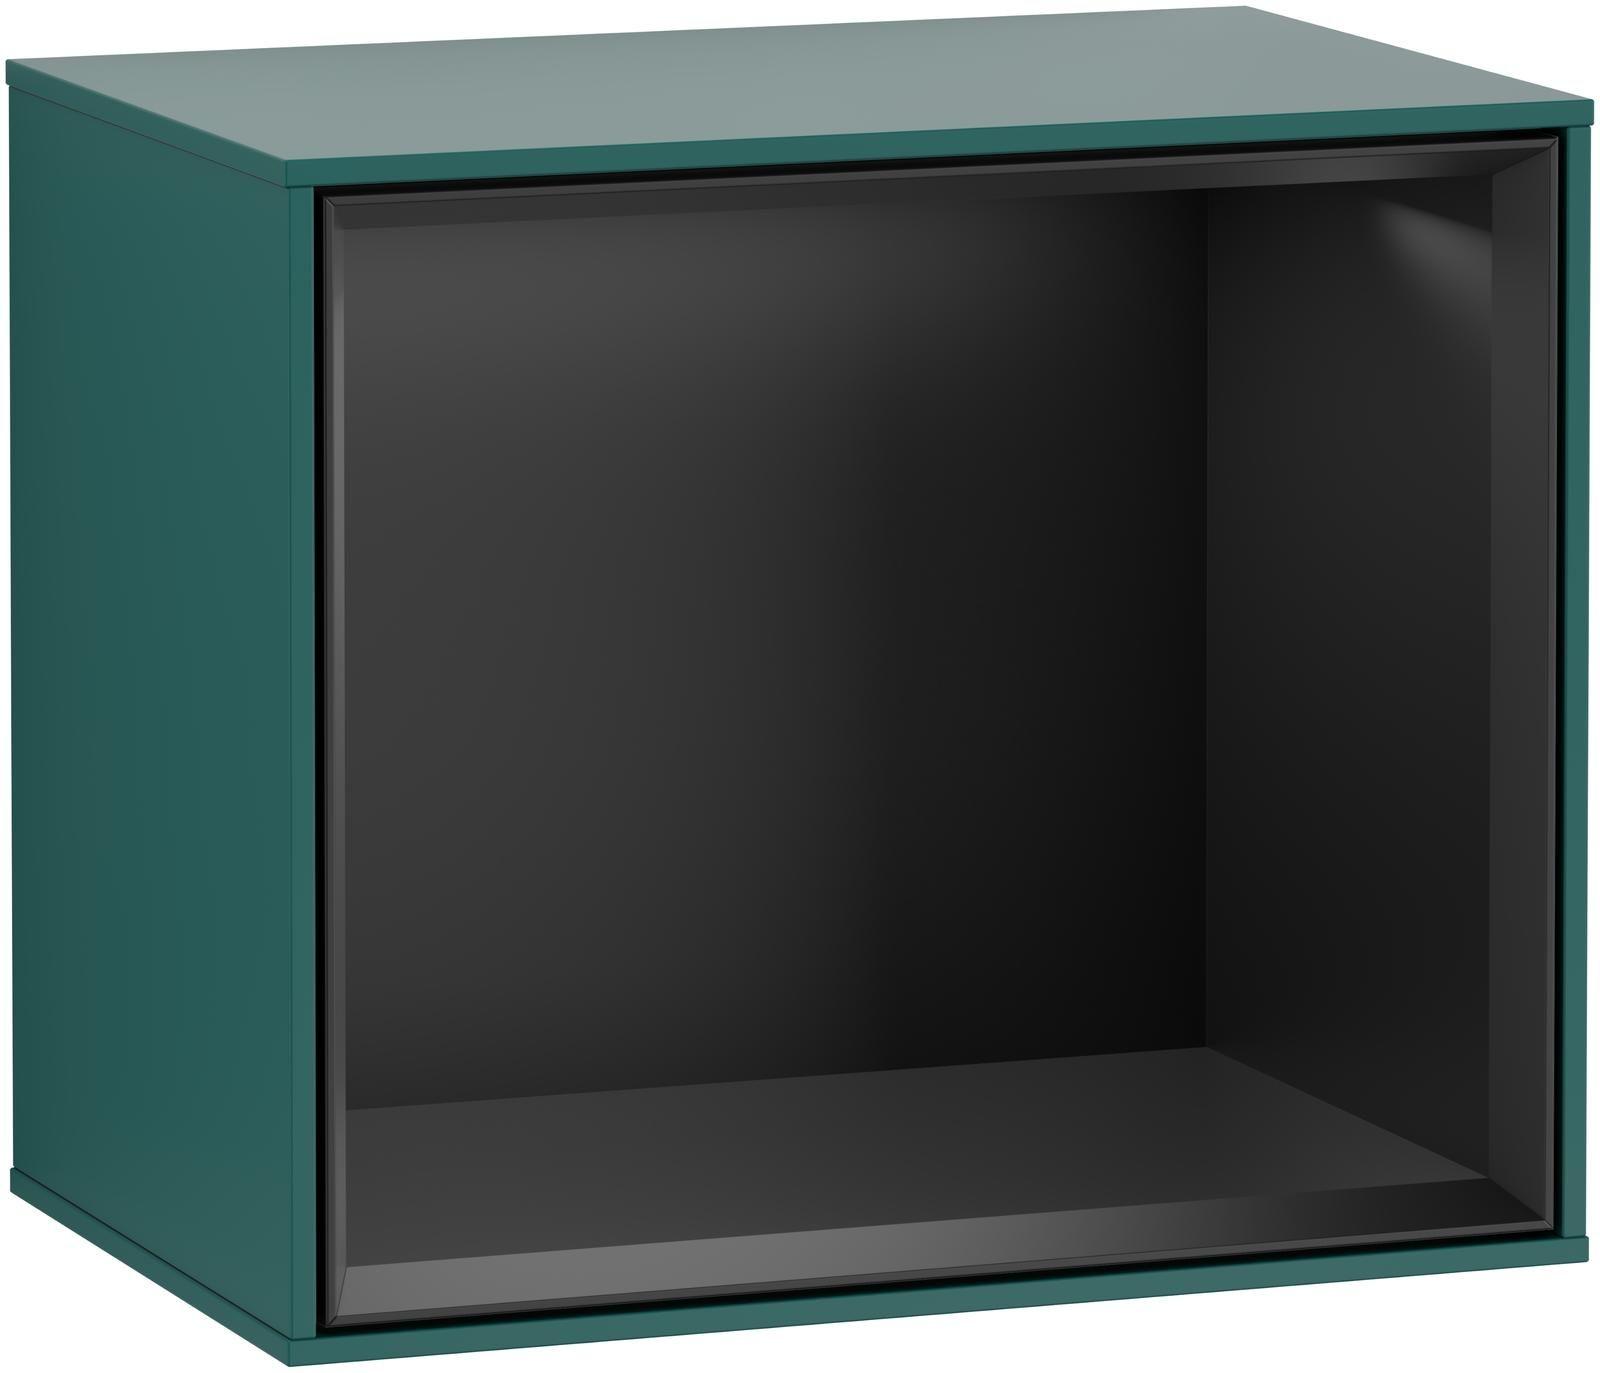 Villeroy & Boch Finion F58 Regalmodul LED-Beleuchtung B:41,8xH:35,6xT:27cm Front, Korpus: Cedar, Regal: Black Matt Lacquer F580PDGS